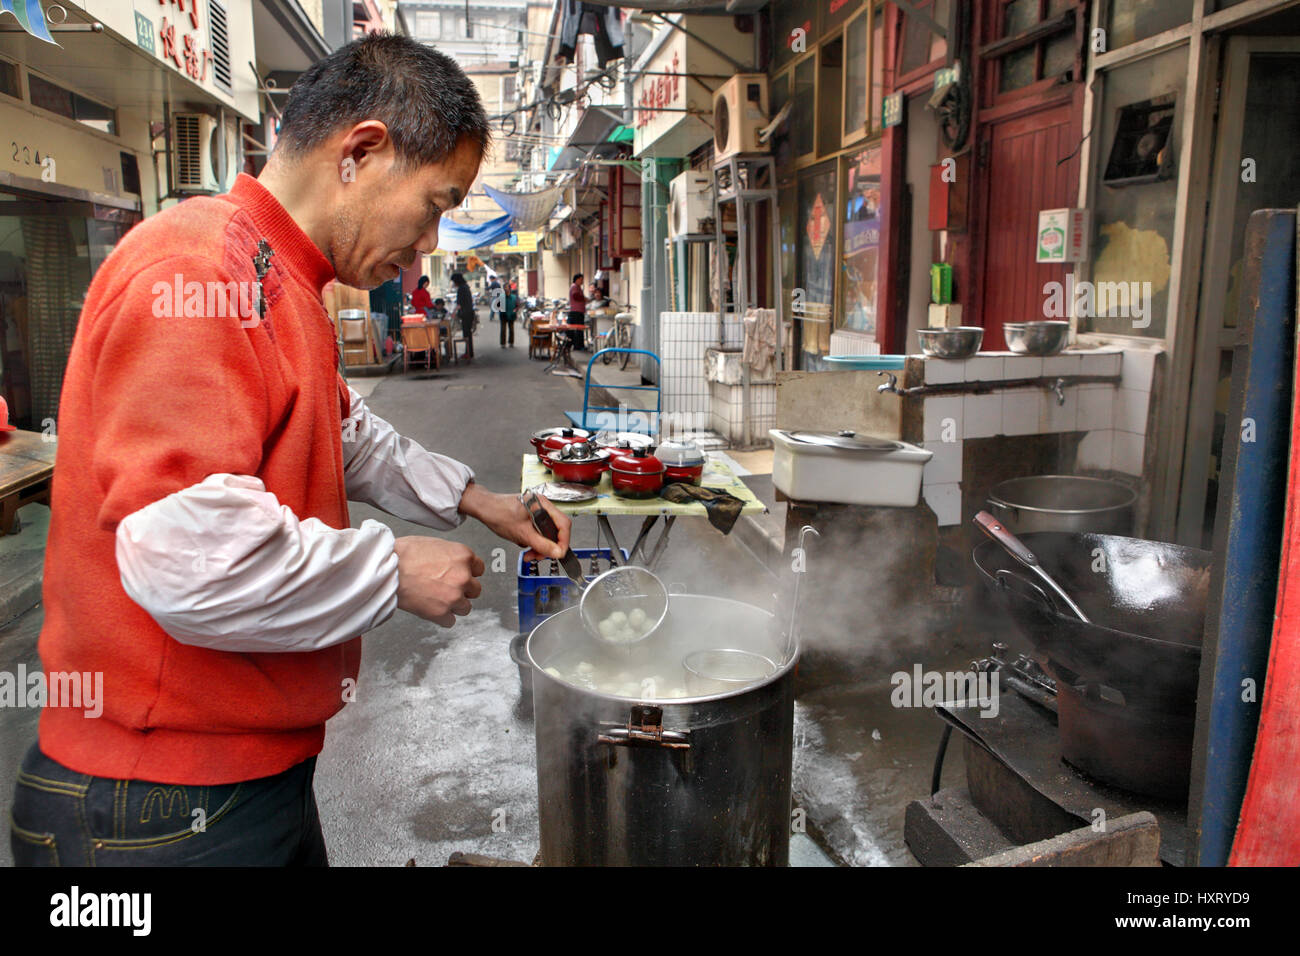 Shanghai, China - April 20, 2010: Seller street food, outdoor, cooking dumplings in a big pot - Stock Image